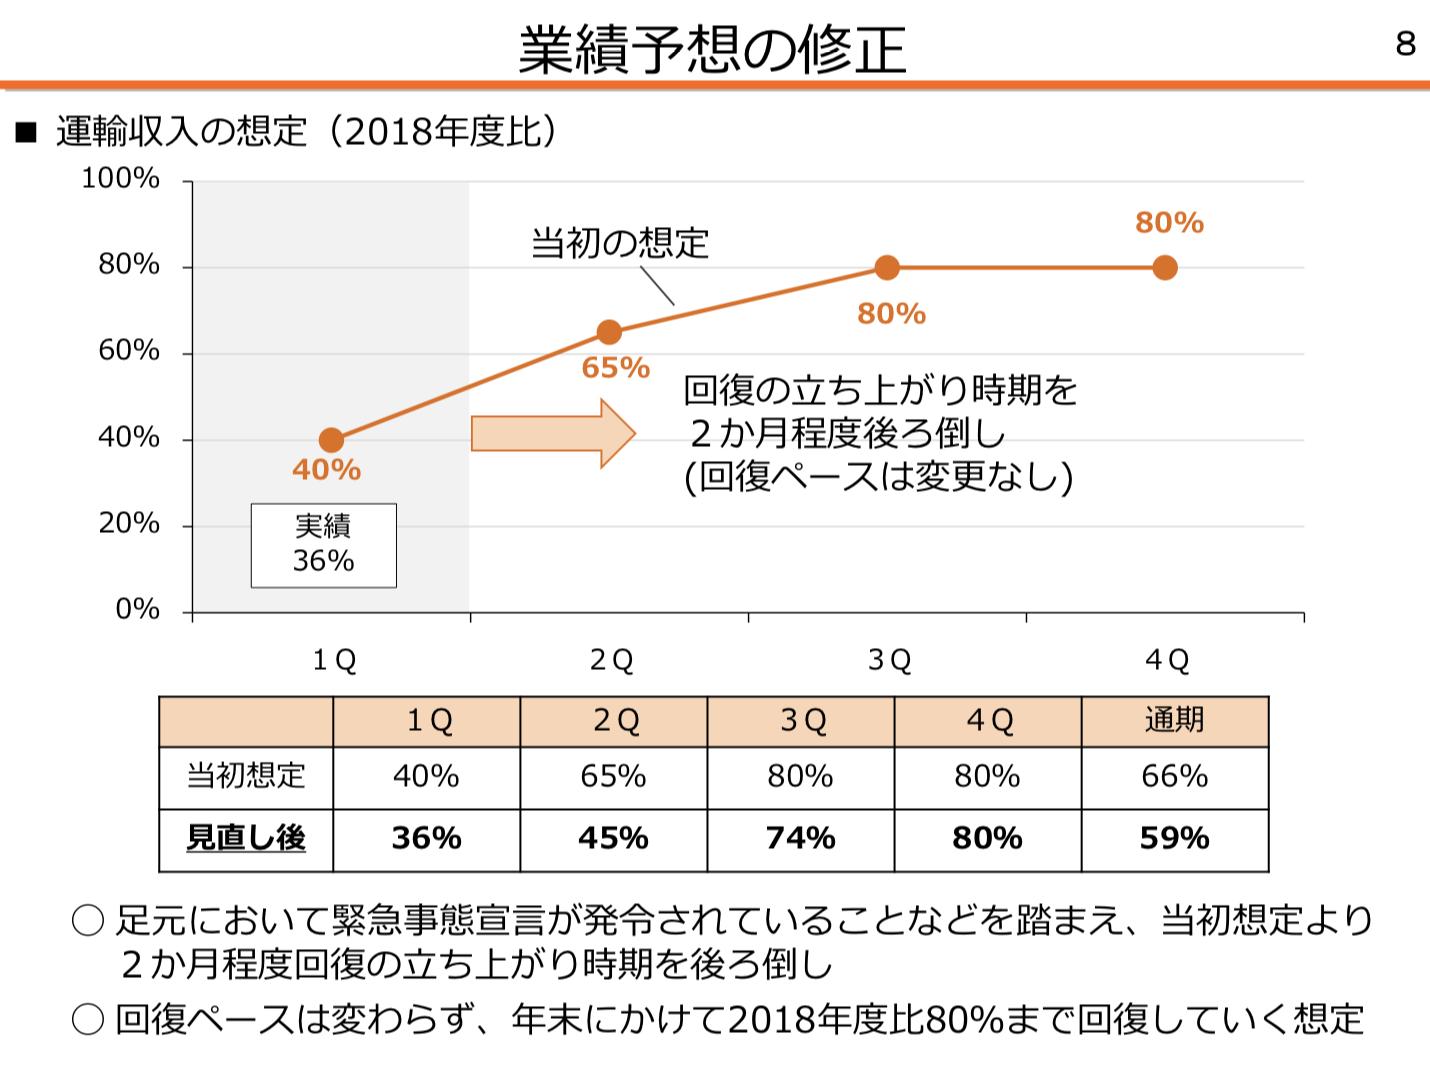 東海旅客鉄道(JR東海) 2021年度1Q決算を徹底解説! さとり世代の株日記 資産運用 株 投資 資産形成